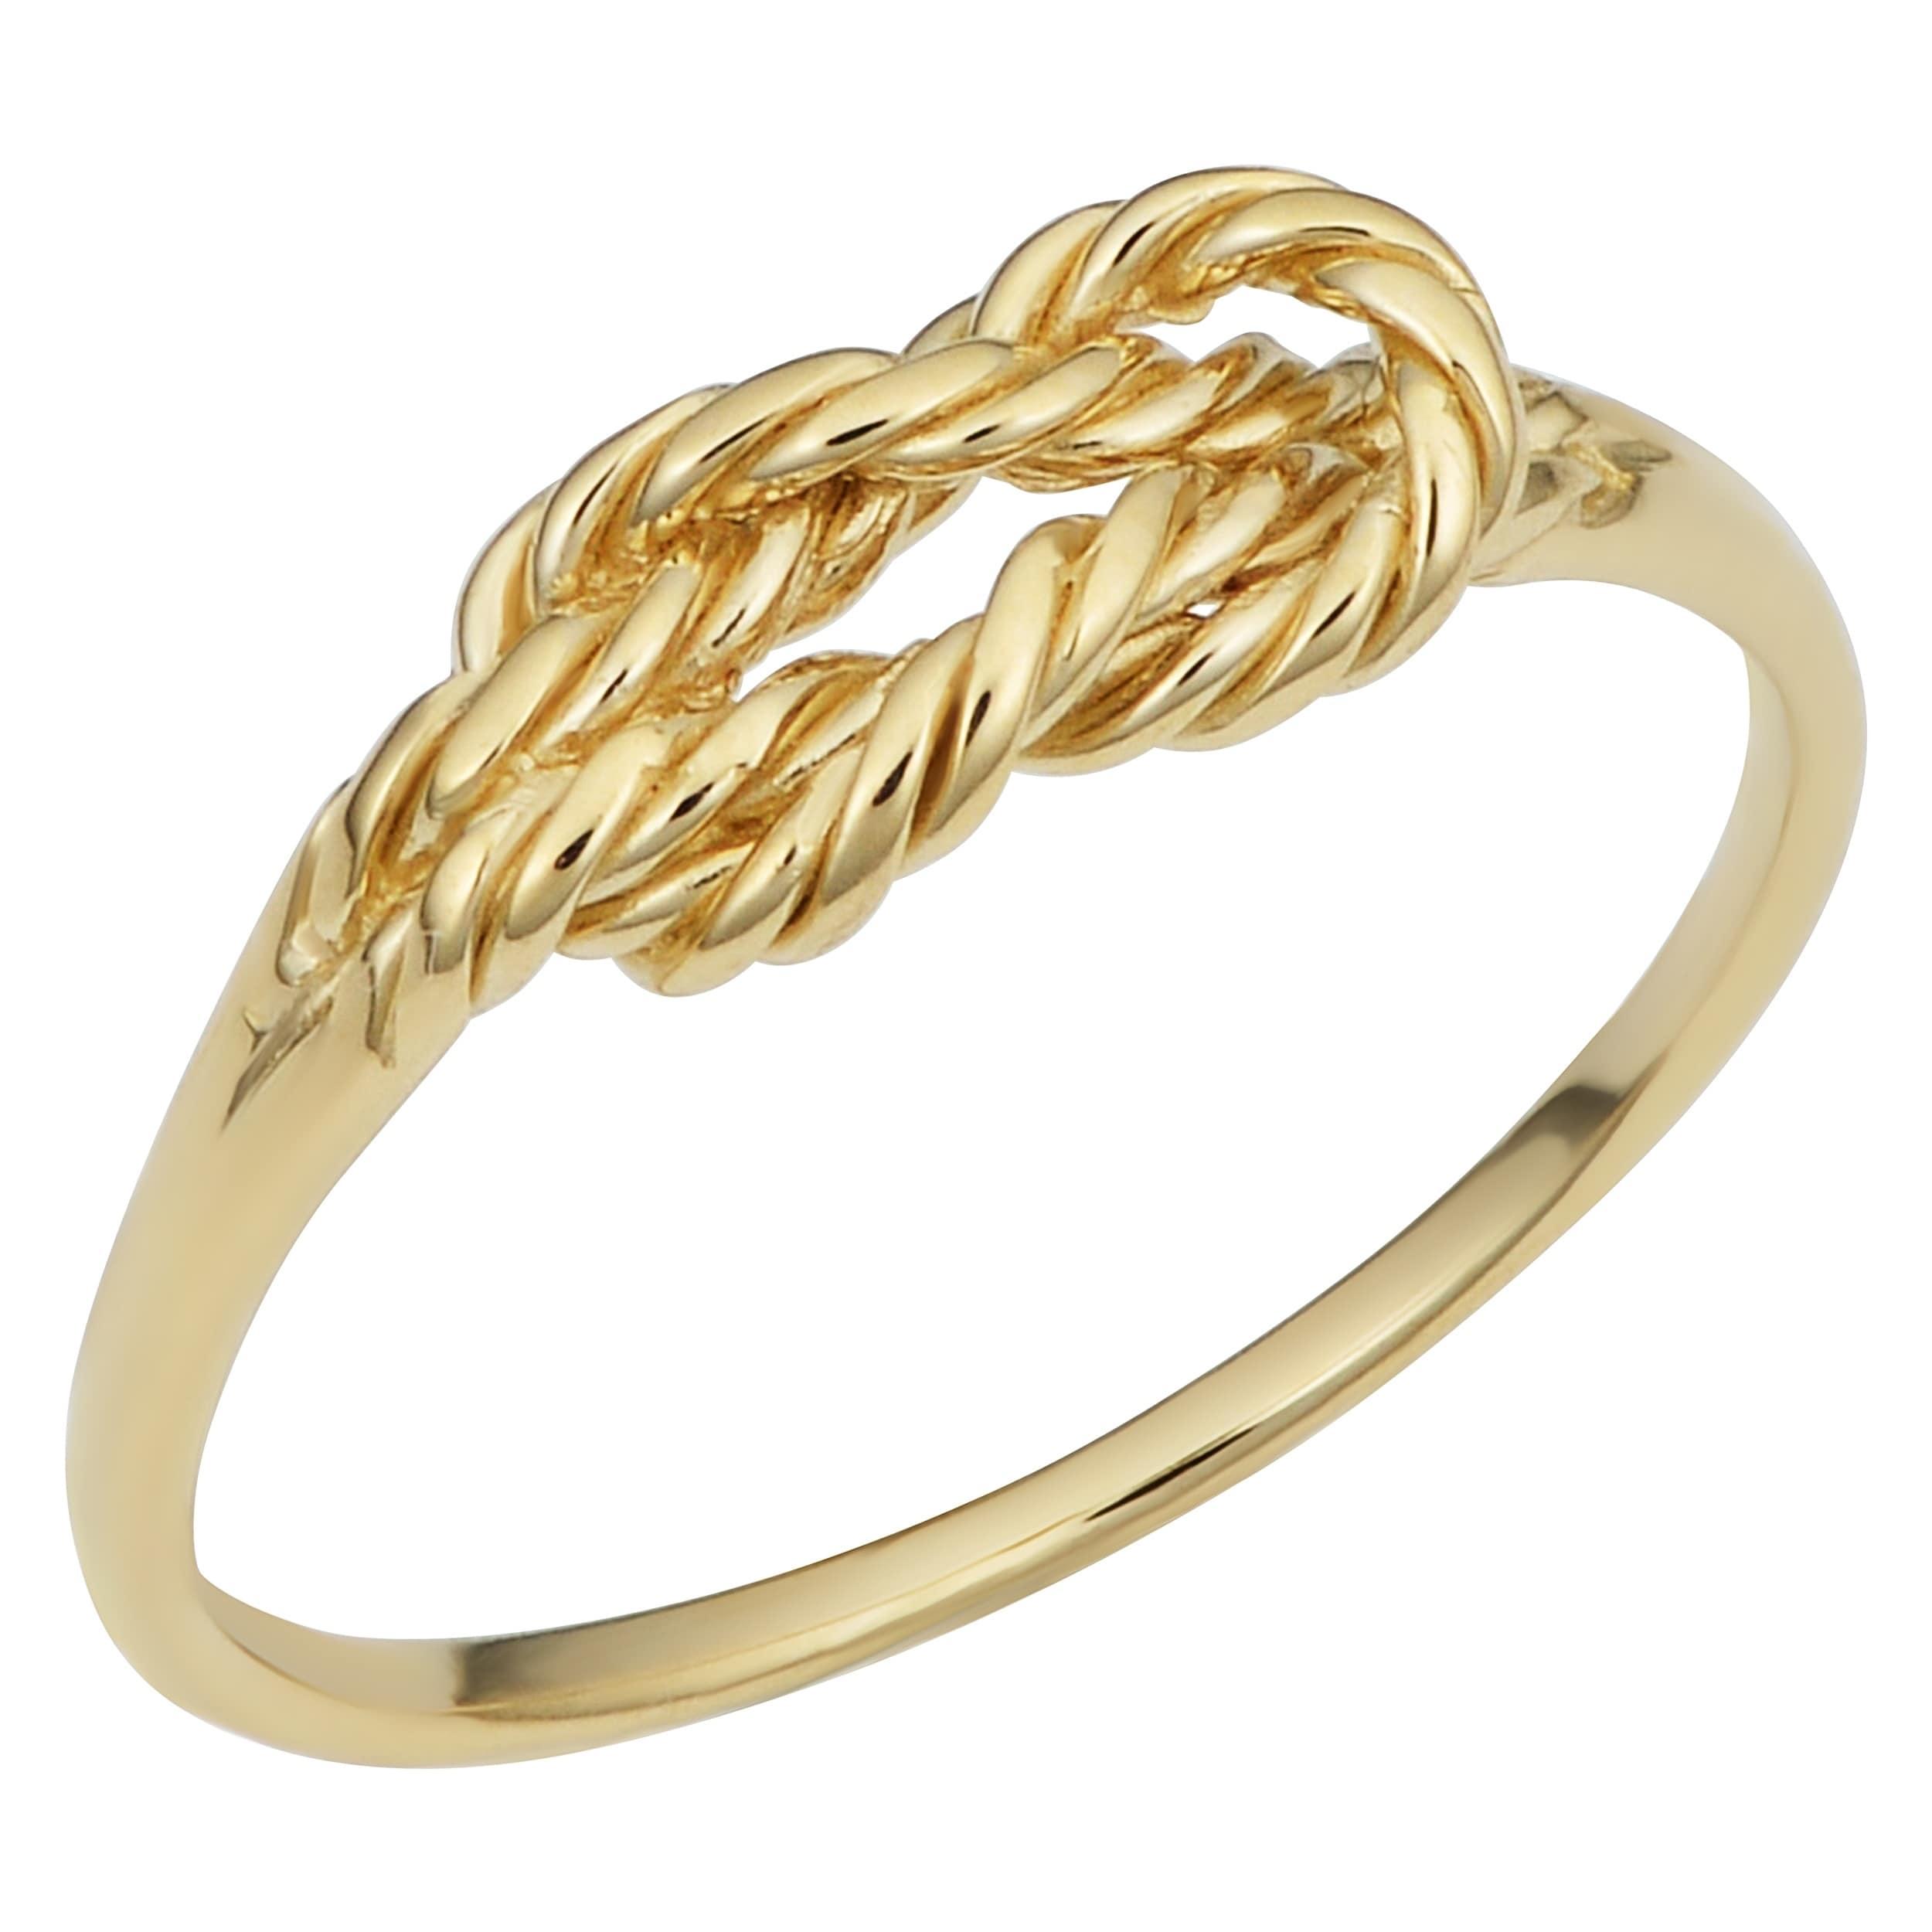 Fremada Italian 14k Yellow Gold Twisted Design Love Knot Ring Overstock 21892848